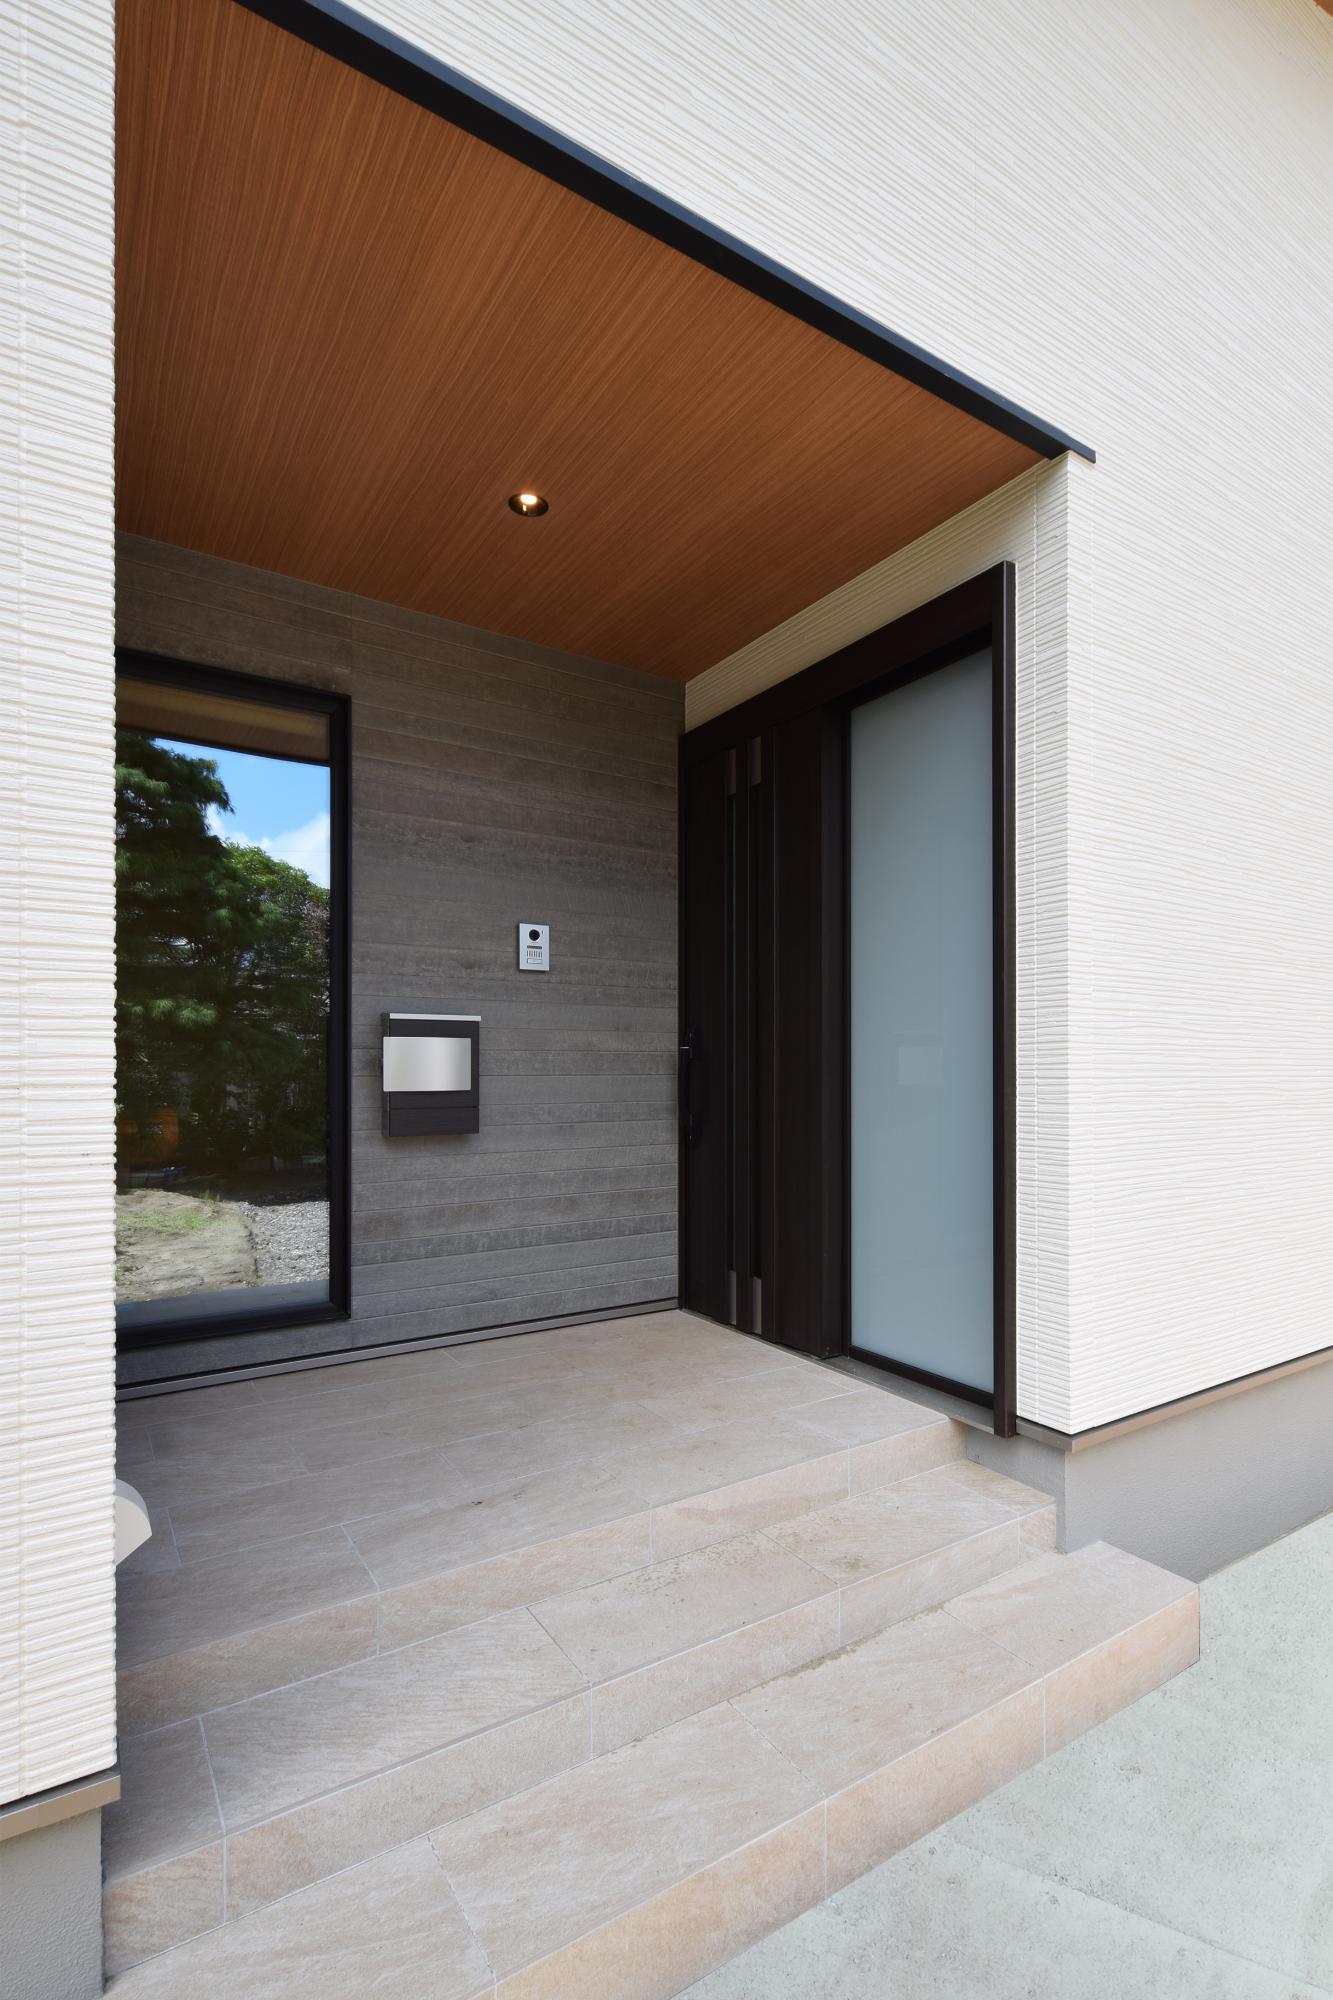 DETAIL HOME(ディテールホーム)「二世帯で住まう和モダン平屋住宅」のモダン・和風・和モダンな外観の実例写真